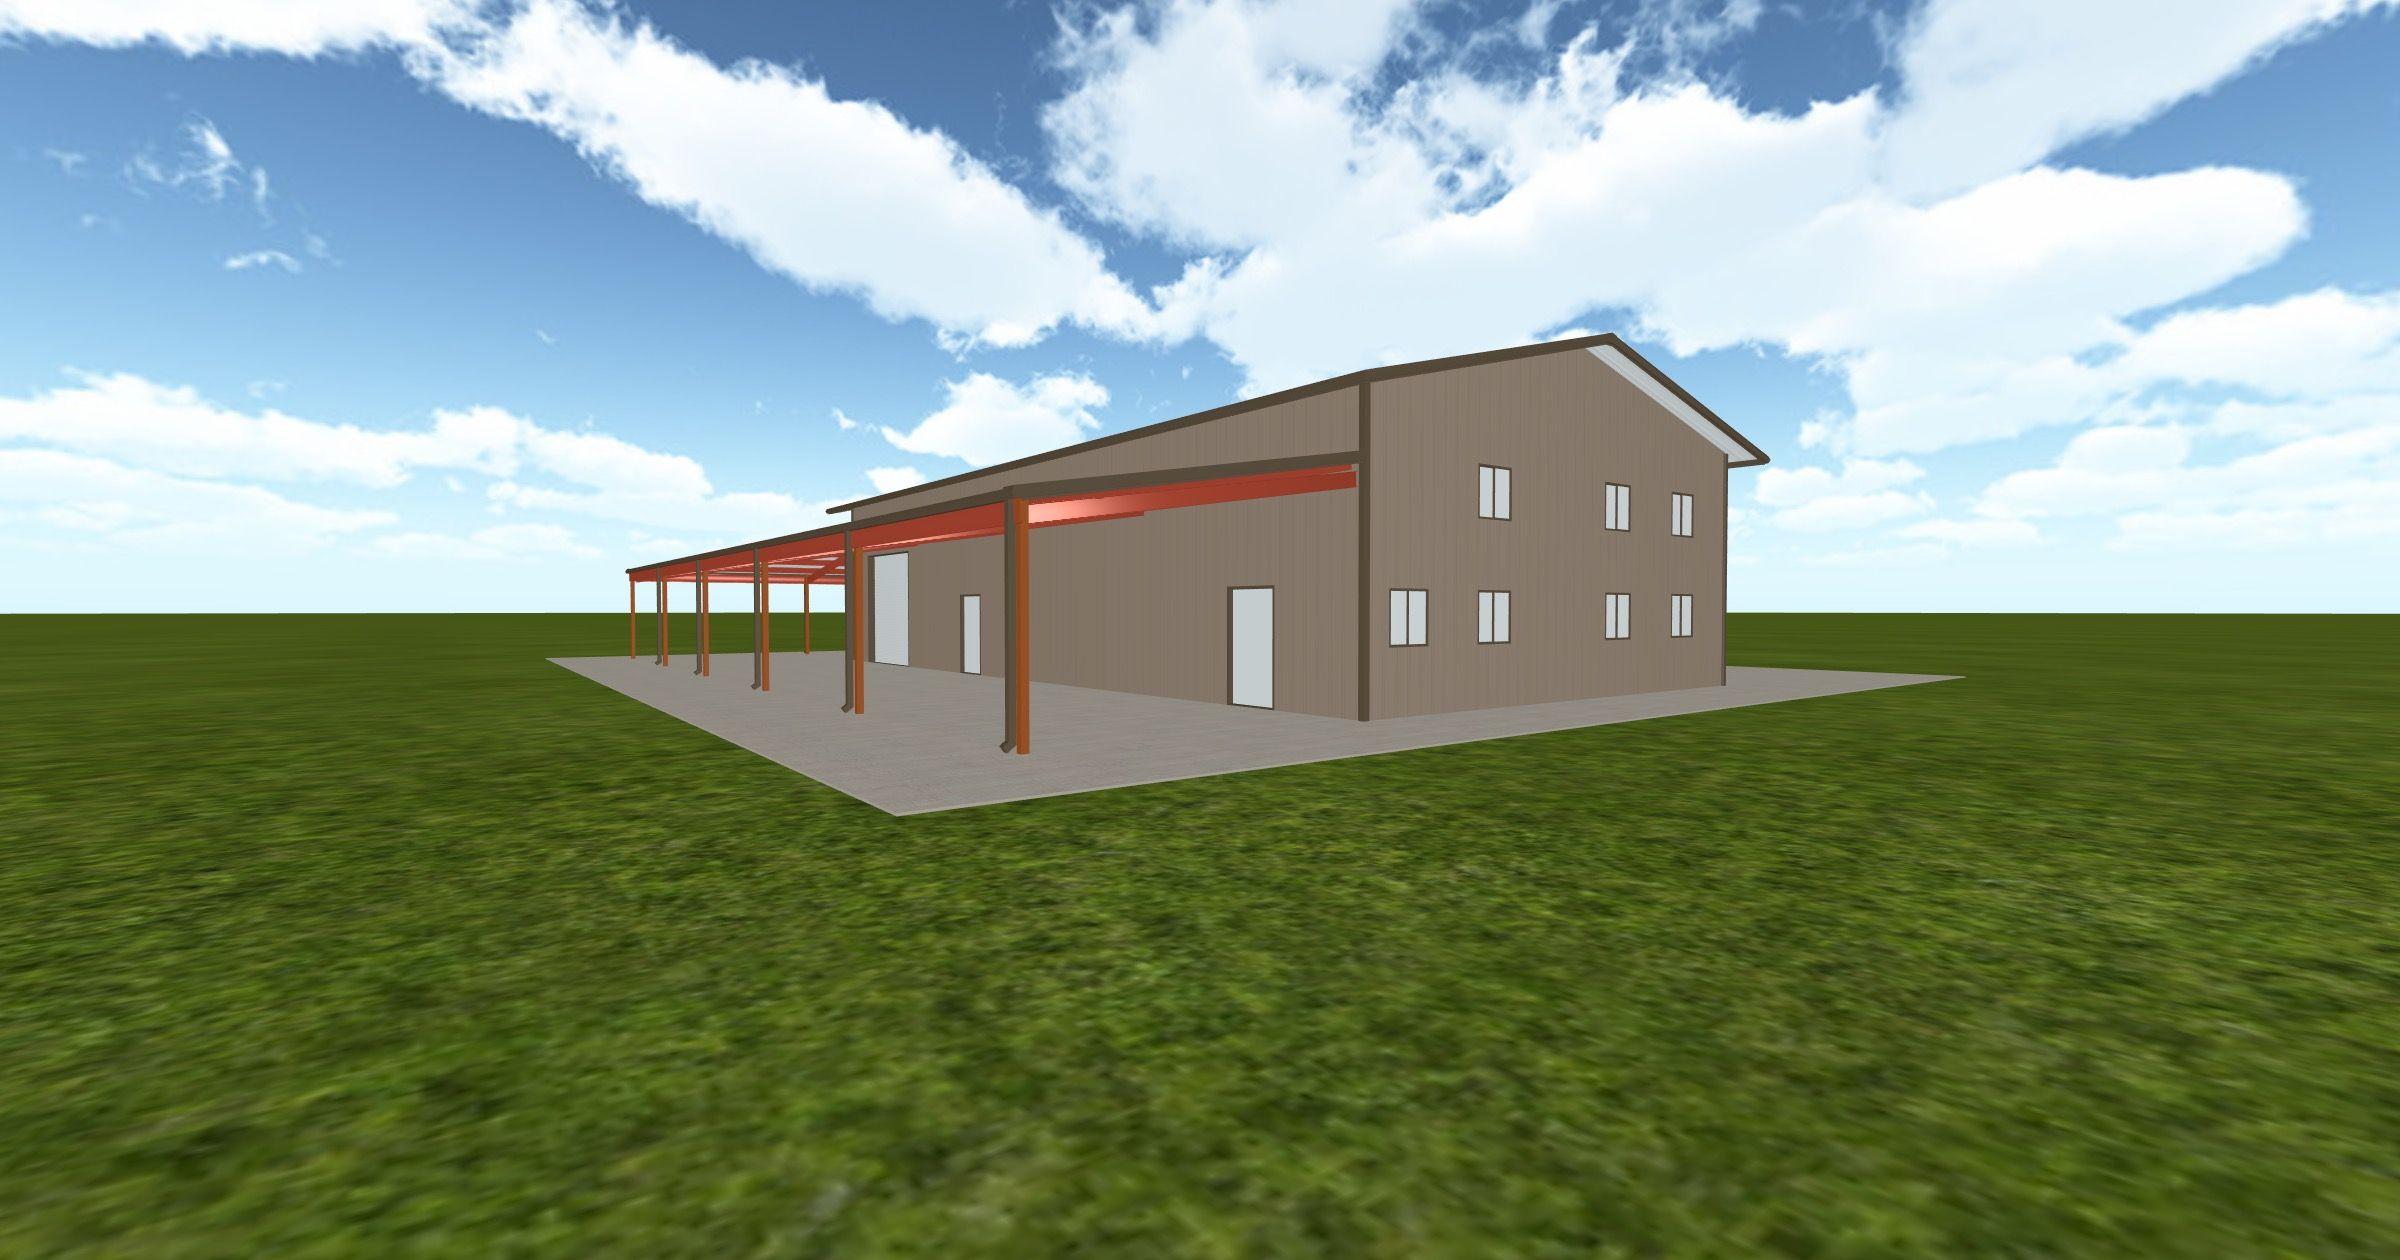 Cool 3D marketing http//ift.tt/2pNvFuj barn